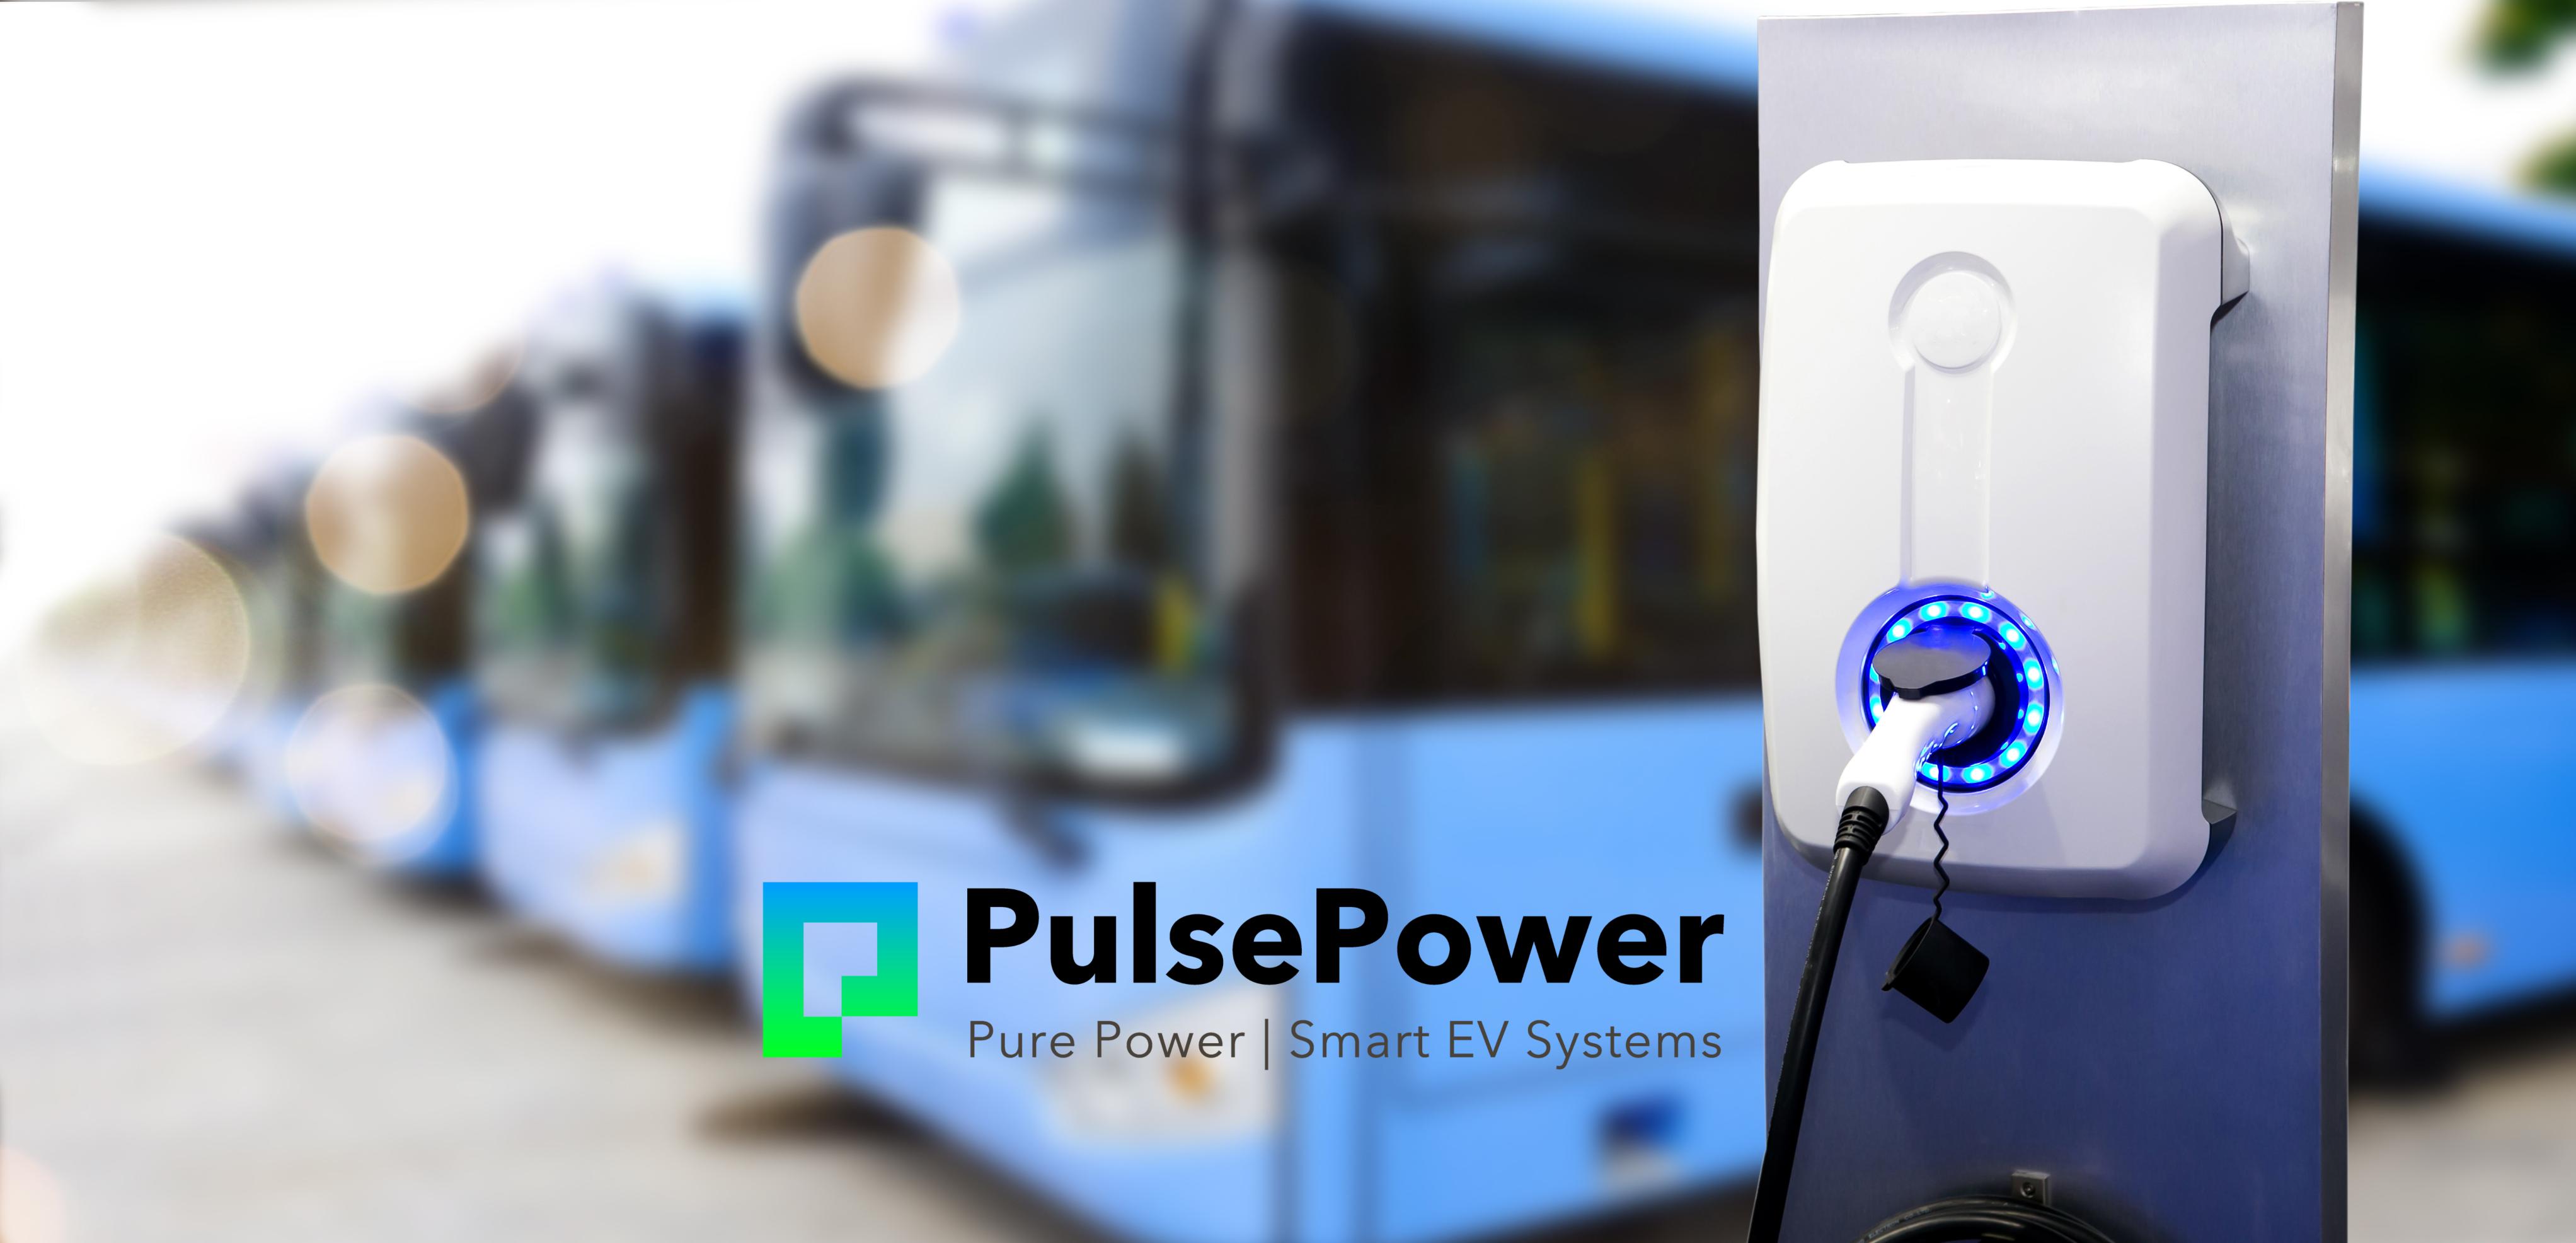 DG - PulsePower EV